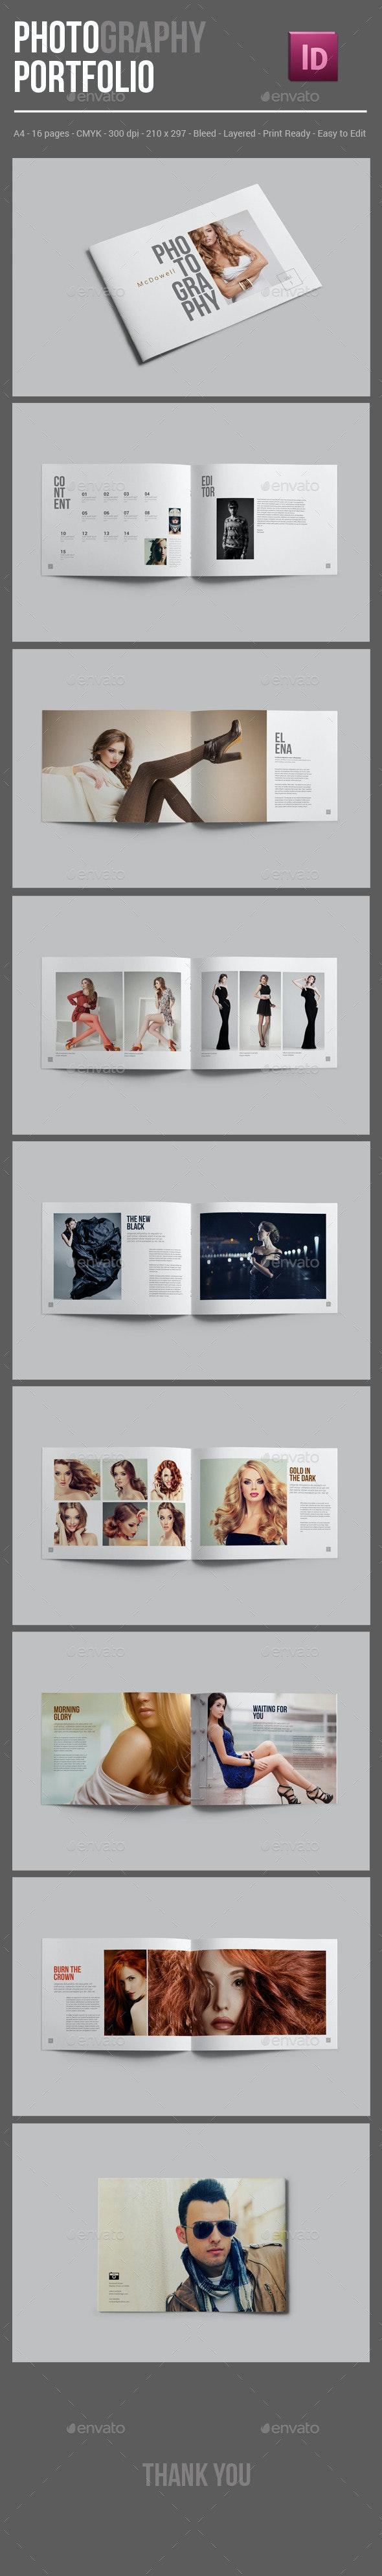 Photography Portfolio Brochure Template - Portfolio Brochures